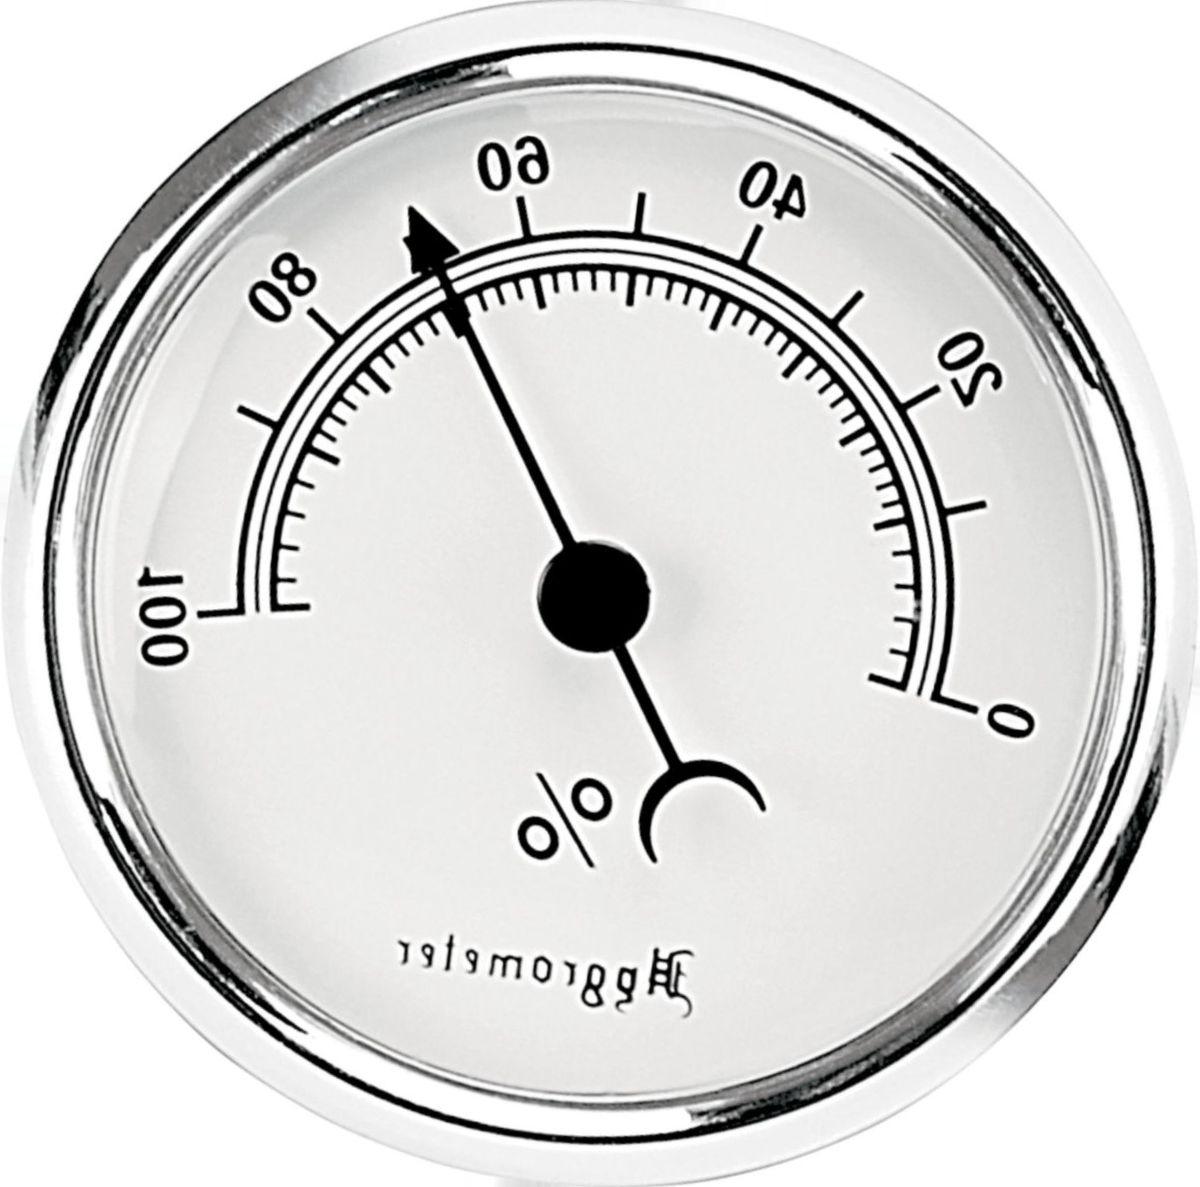 Lockdown™ Hygrometer